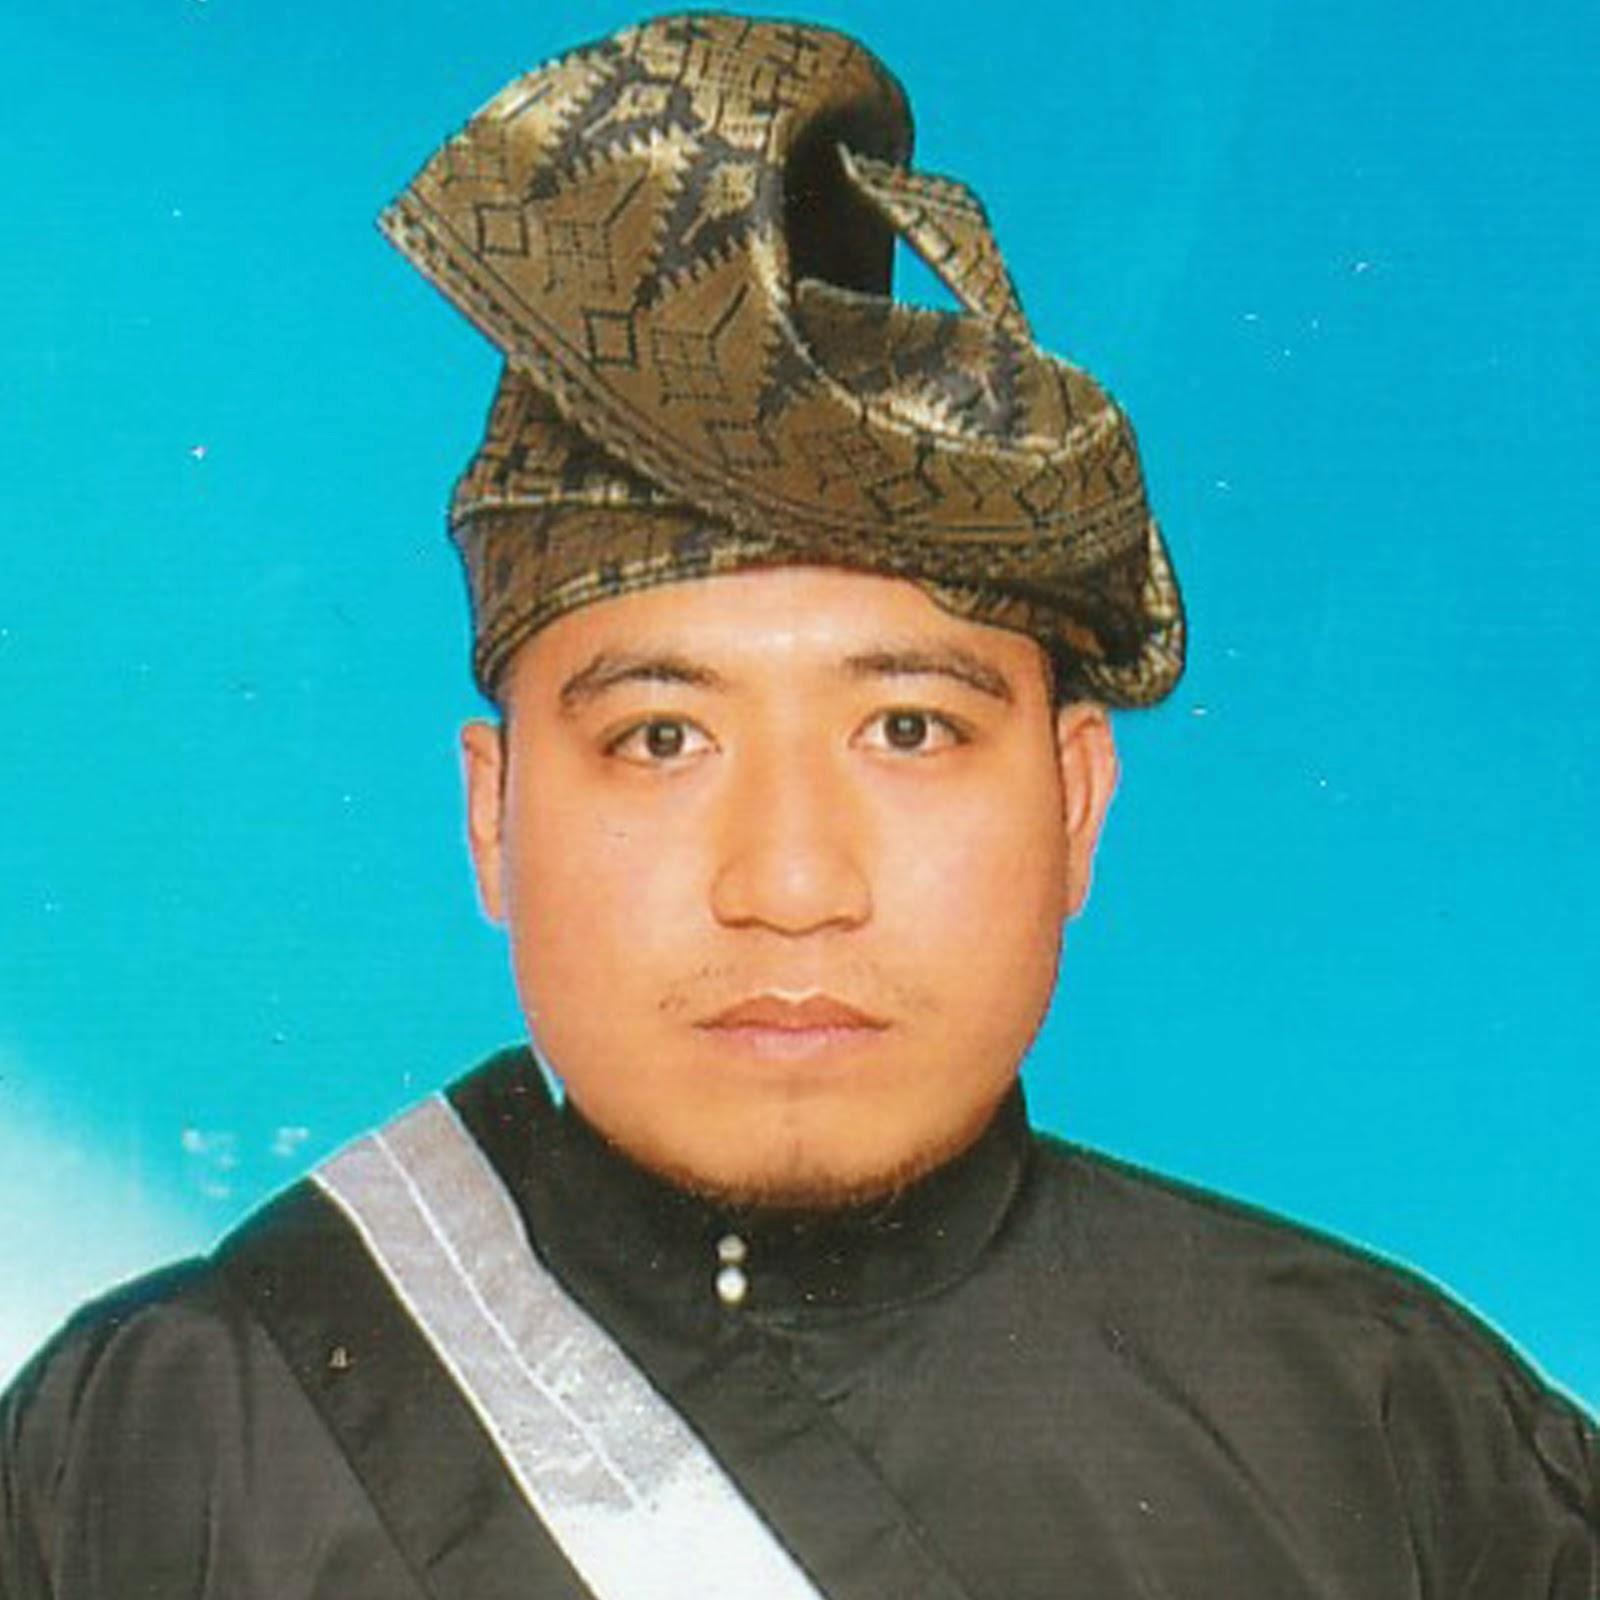 Timbalan Pengerusi Majlis Gurulatih PSSGM Hulu Selangor